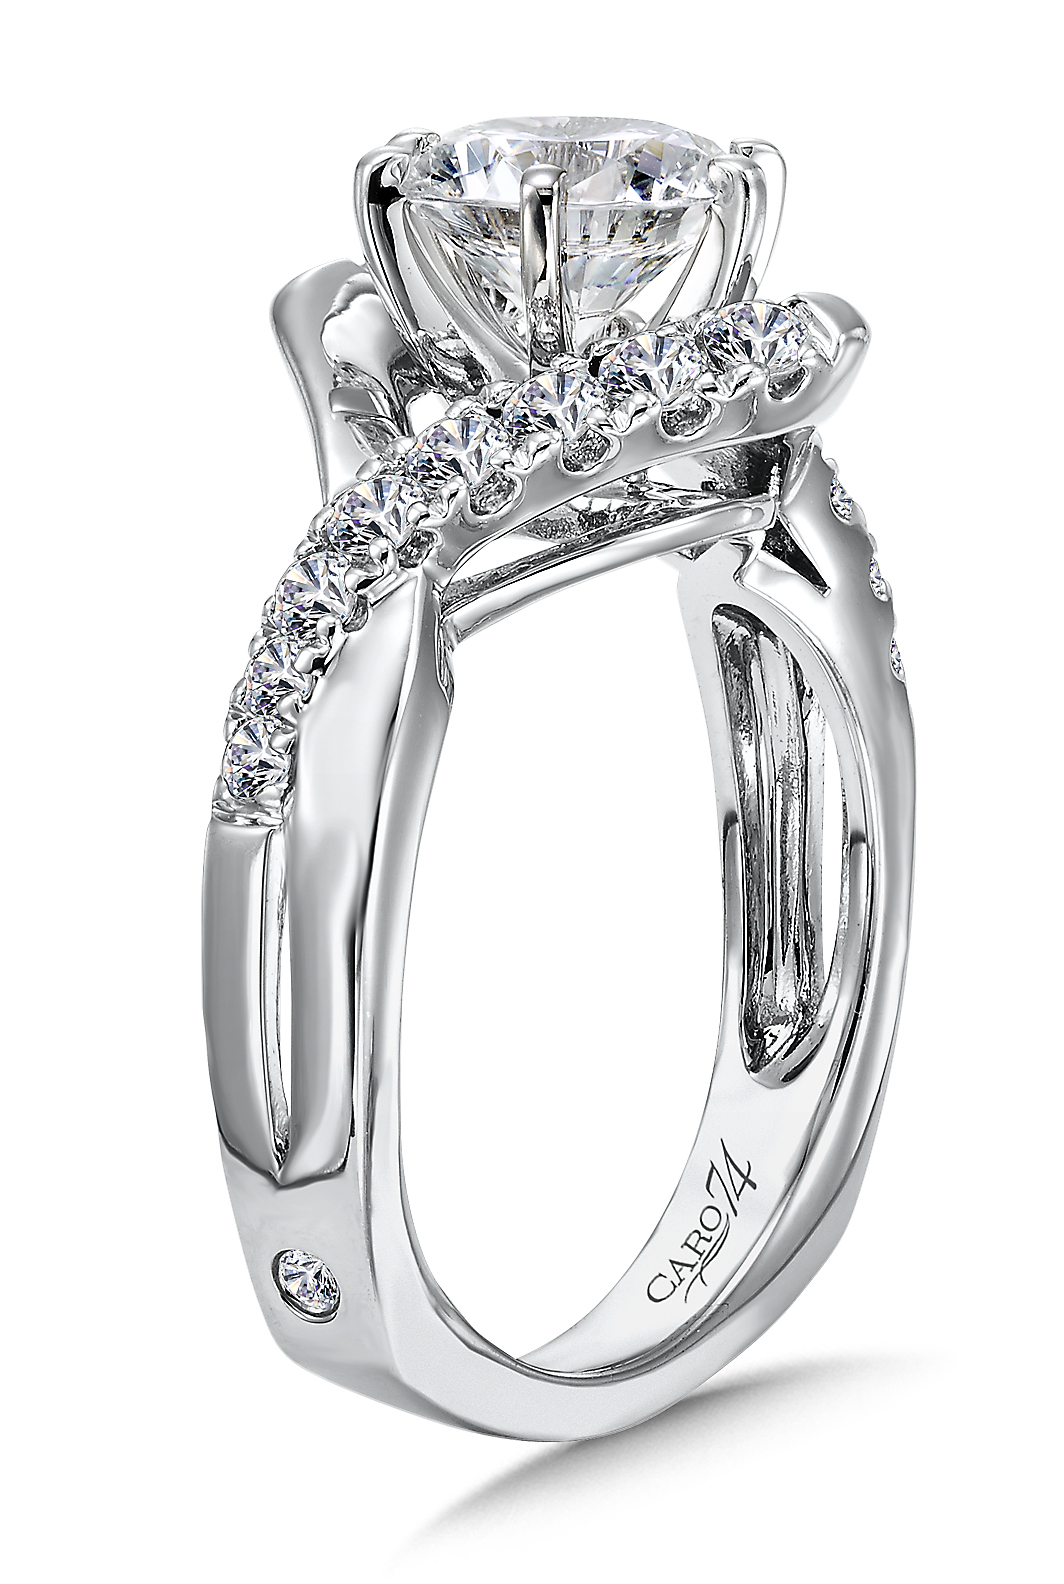 Wholesale Custom Engagement Rings Dallas 2, Shira Diamonds